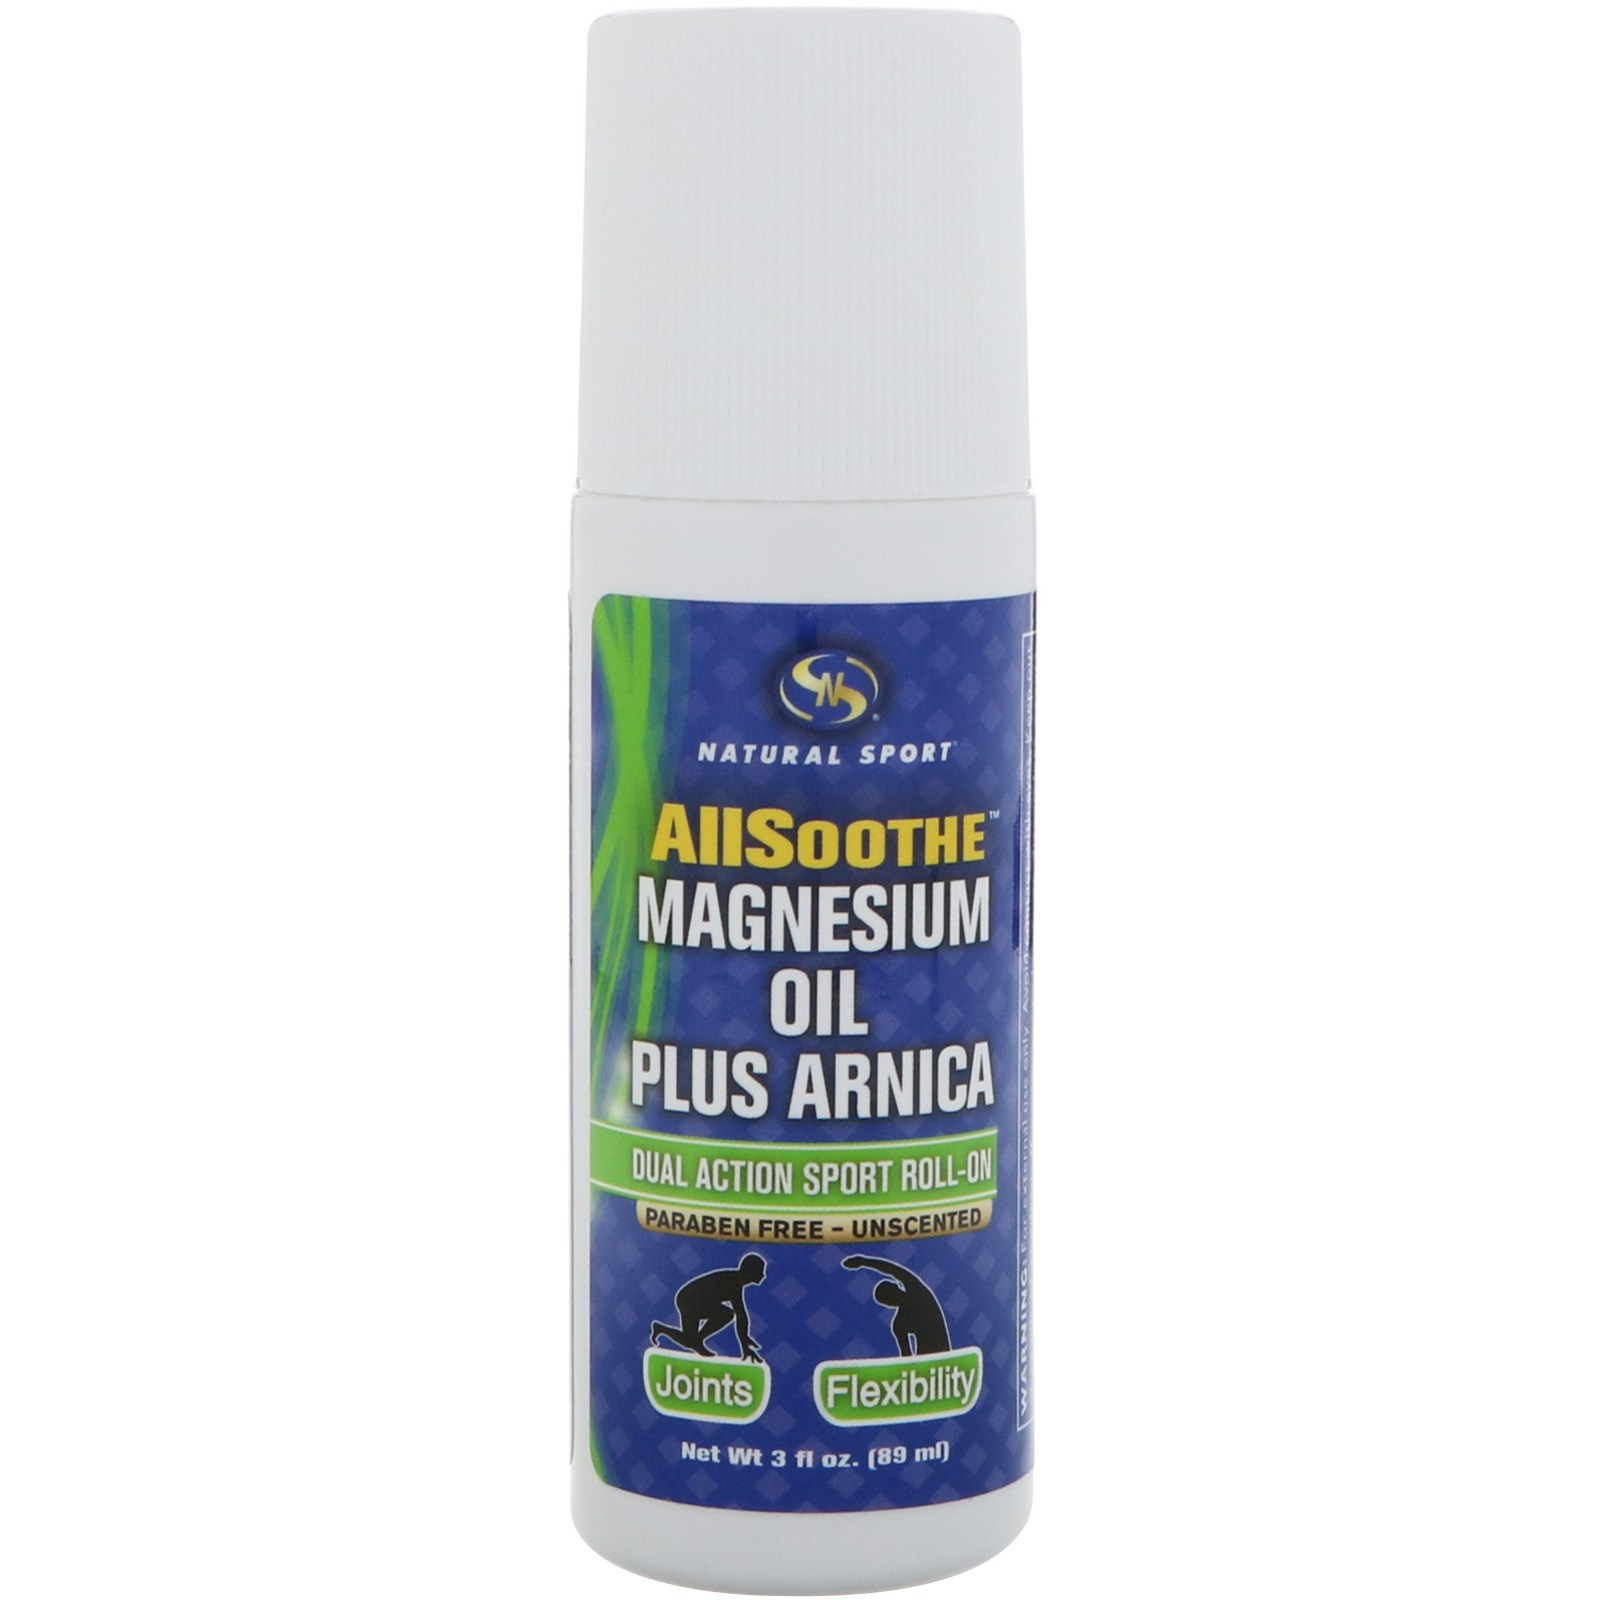 Natural Sport, AllSoothe, Magnesium Oil Plus Arnica, Unscented, 3 fl oz (89 ml)